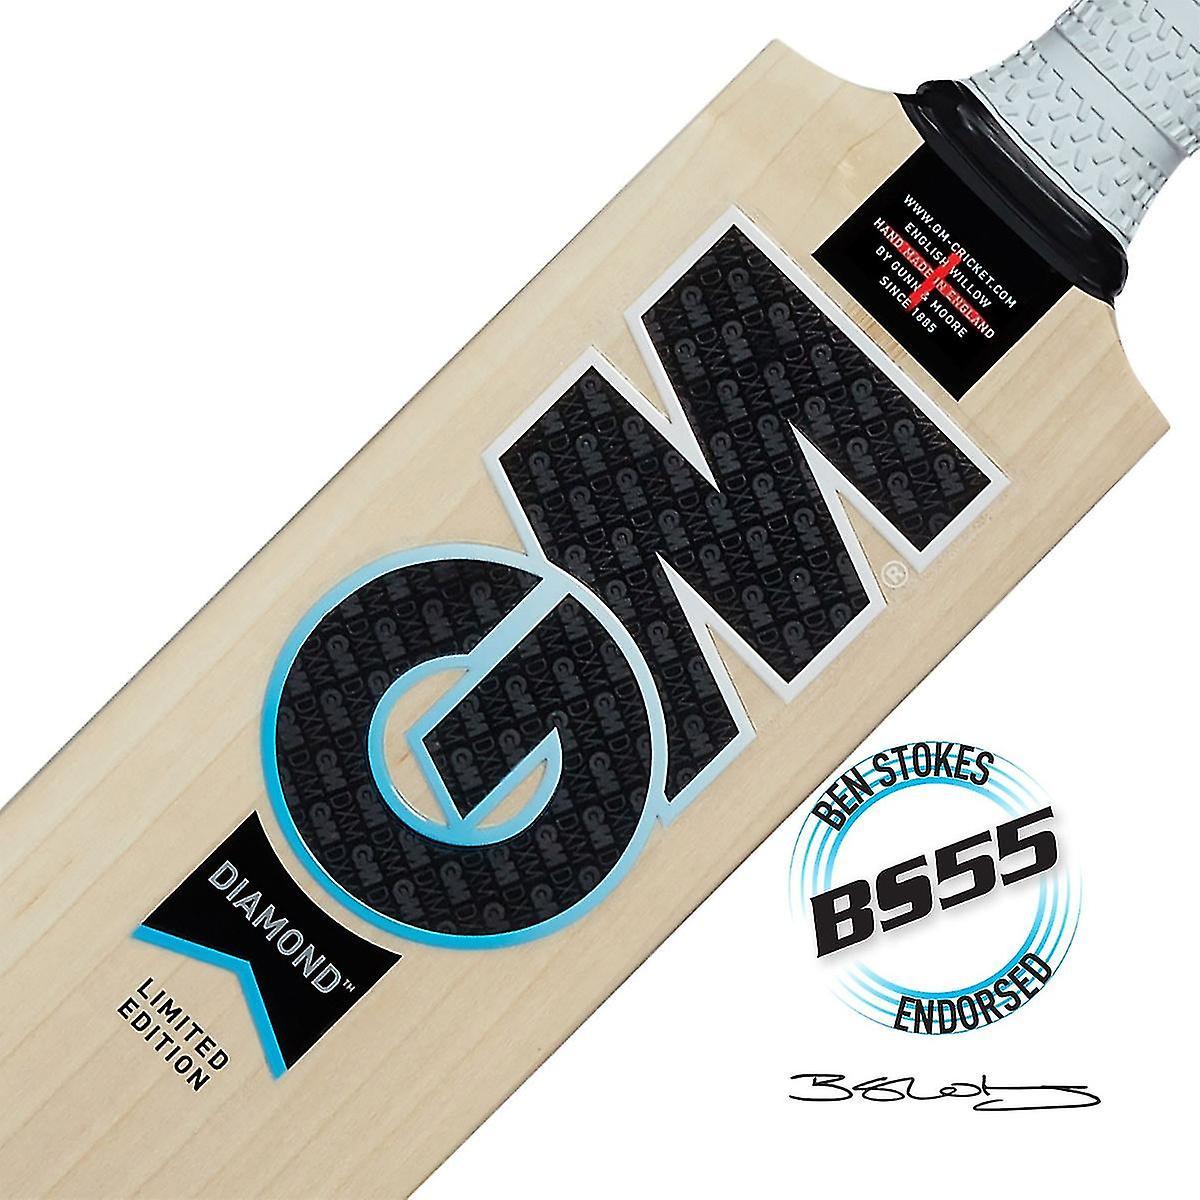 Gunn & Moore GM Cricket Diamond 606 L540 DXM BS55 Ben Stokes English Willow Bat